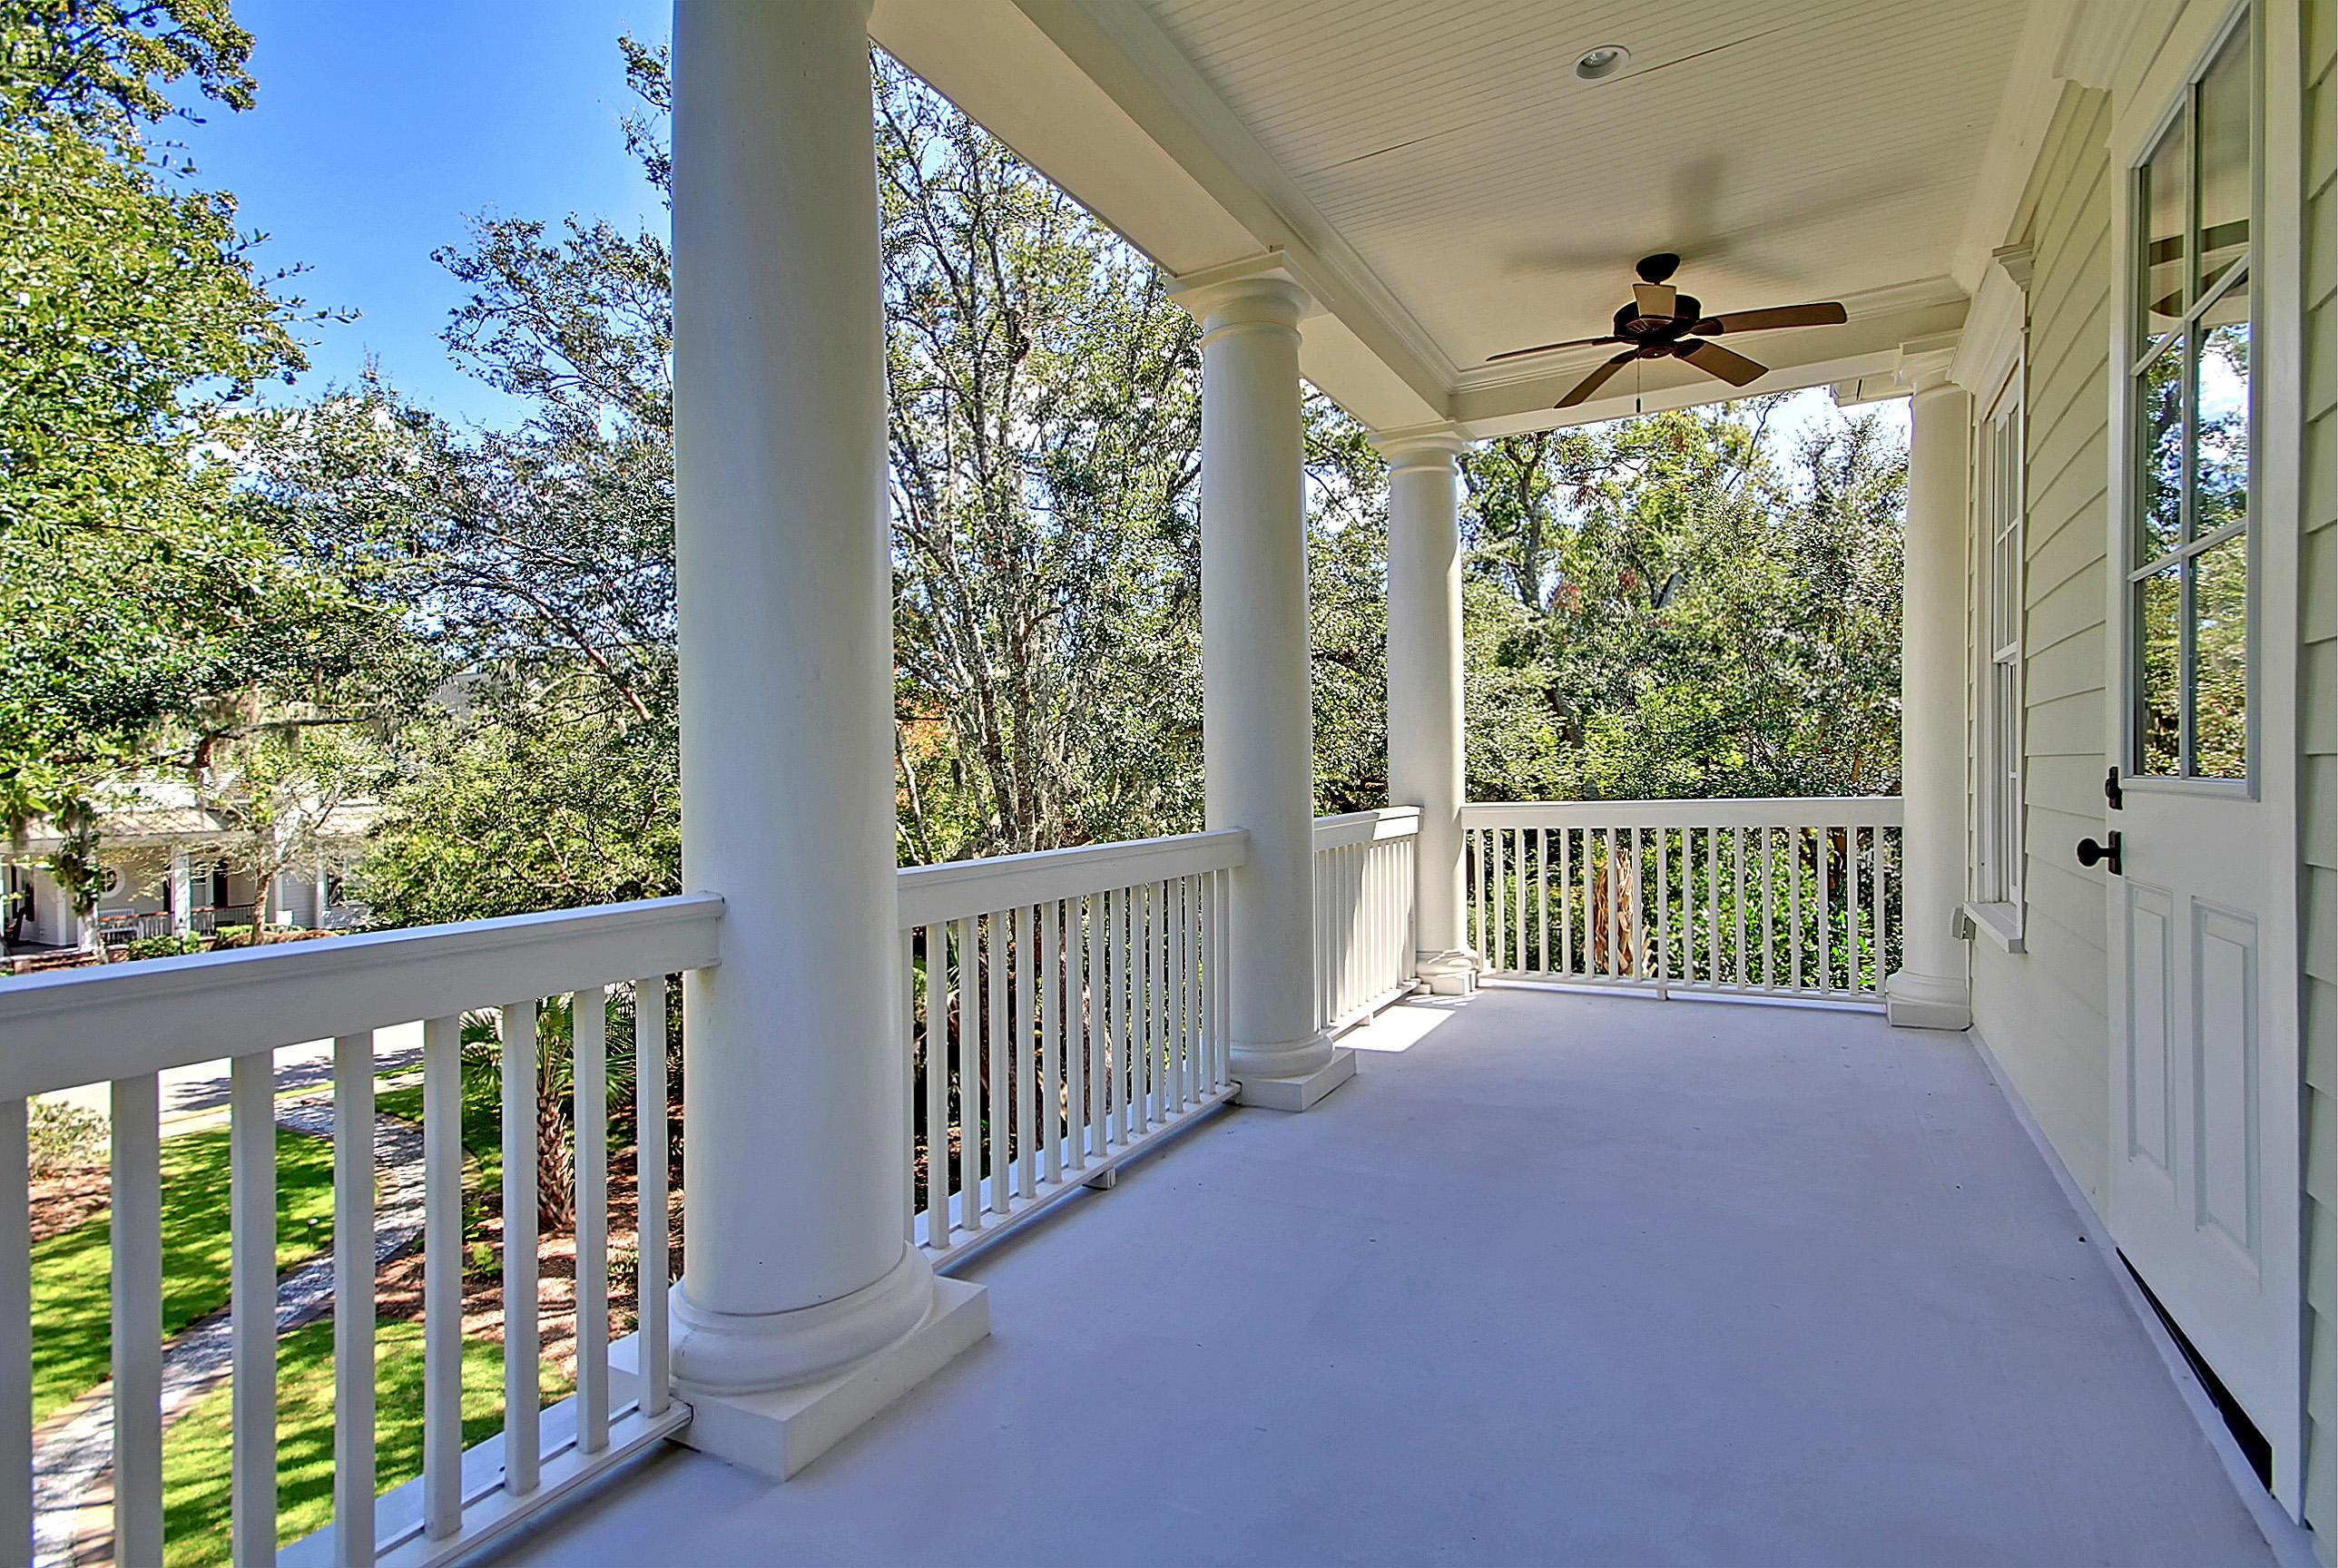 Daniel Island Homes For Sale - 263 Delahow, Daniel Island, SC - 11